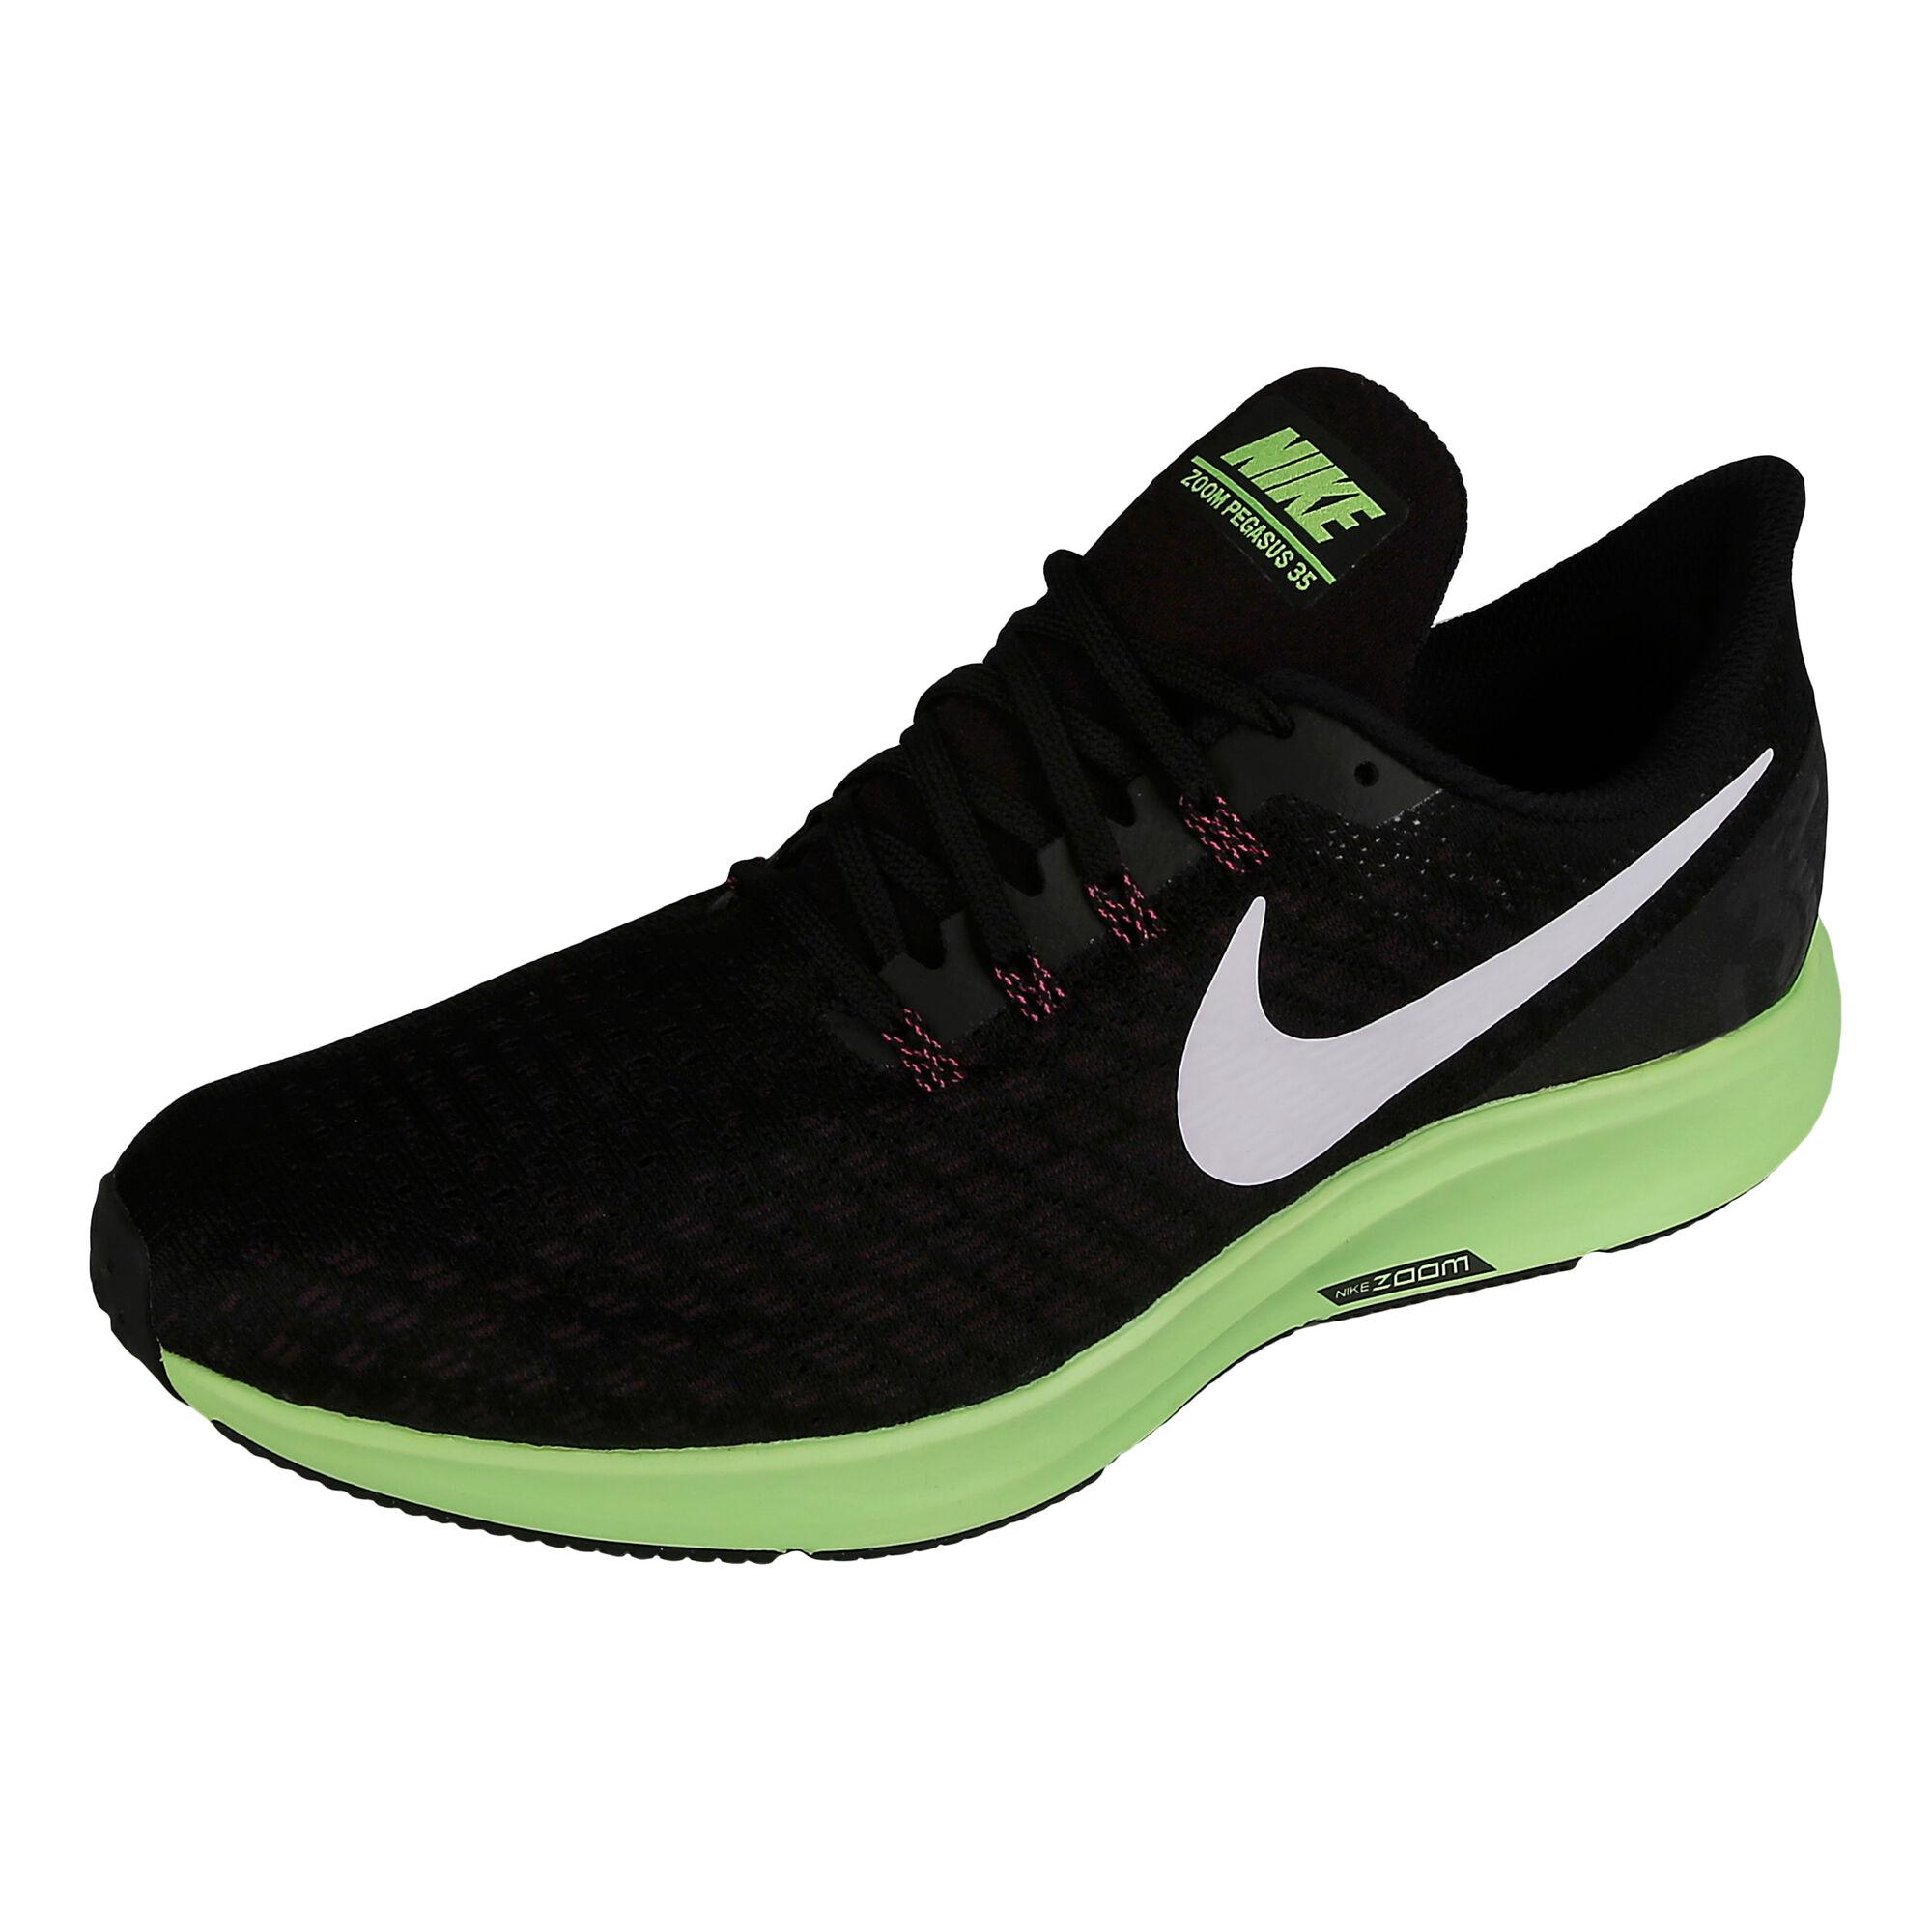 premium selection 8372e 6681e buy Nike Air Zoom Pegasus 35 Neutral Running Shoe Men ...